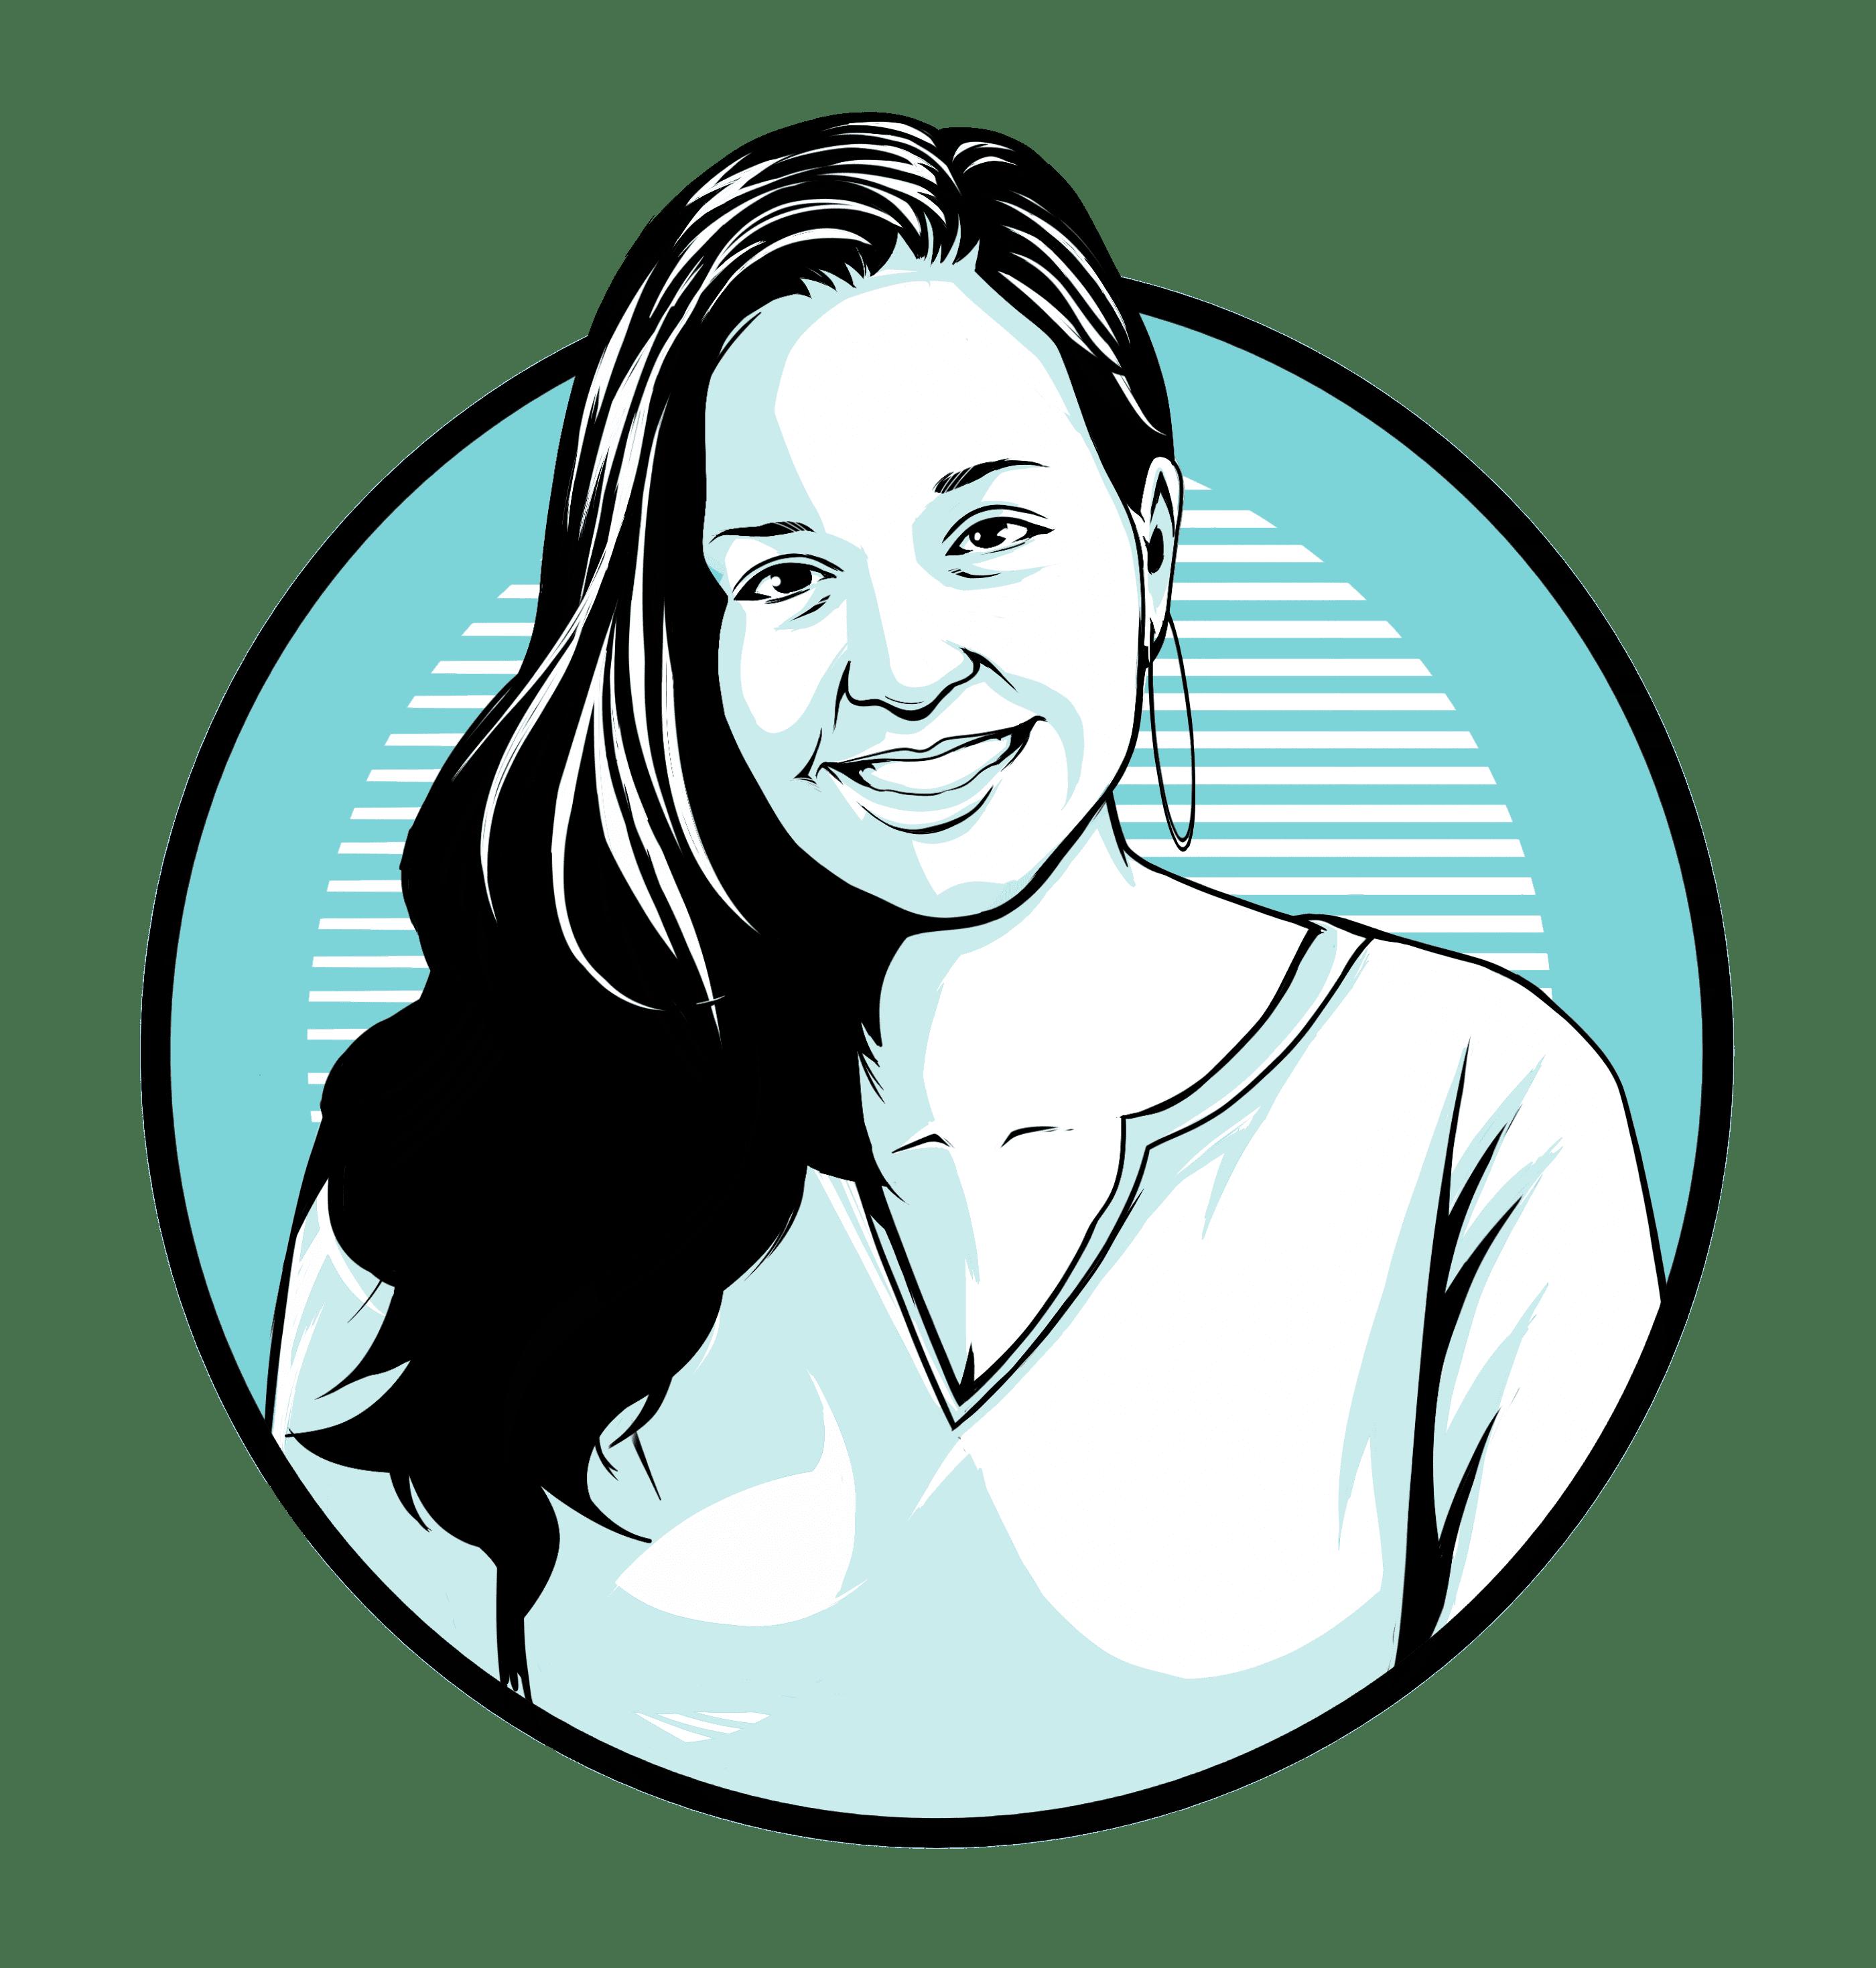 Caricature of Gina Desiderio